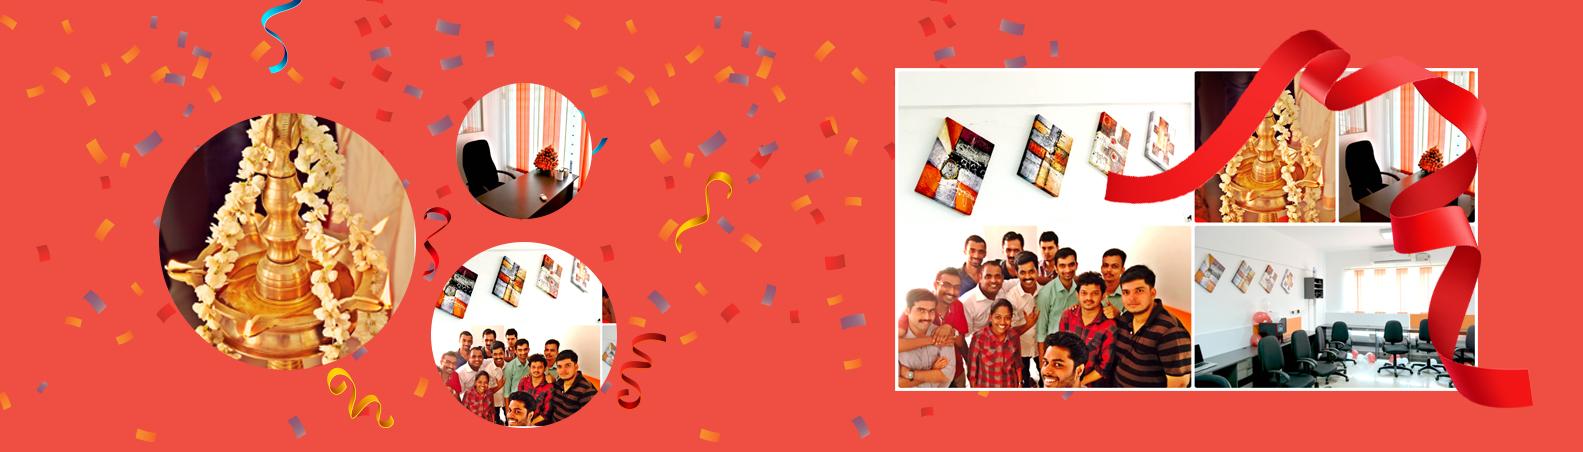 2BaseTechnologies Open New Office in Kochi | Software Company